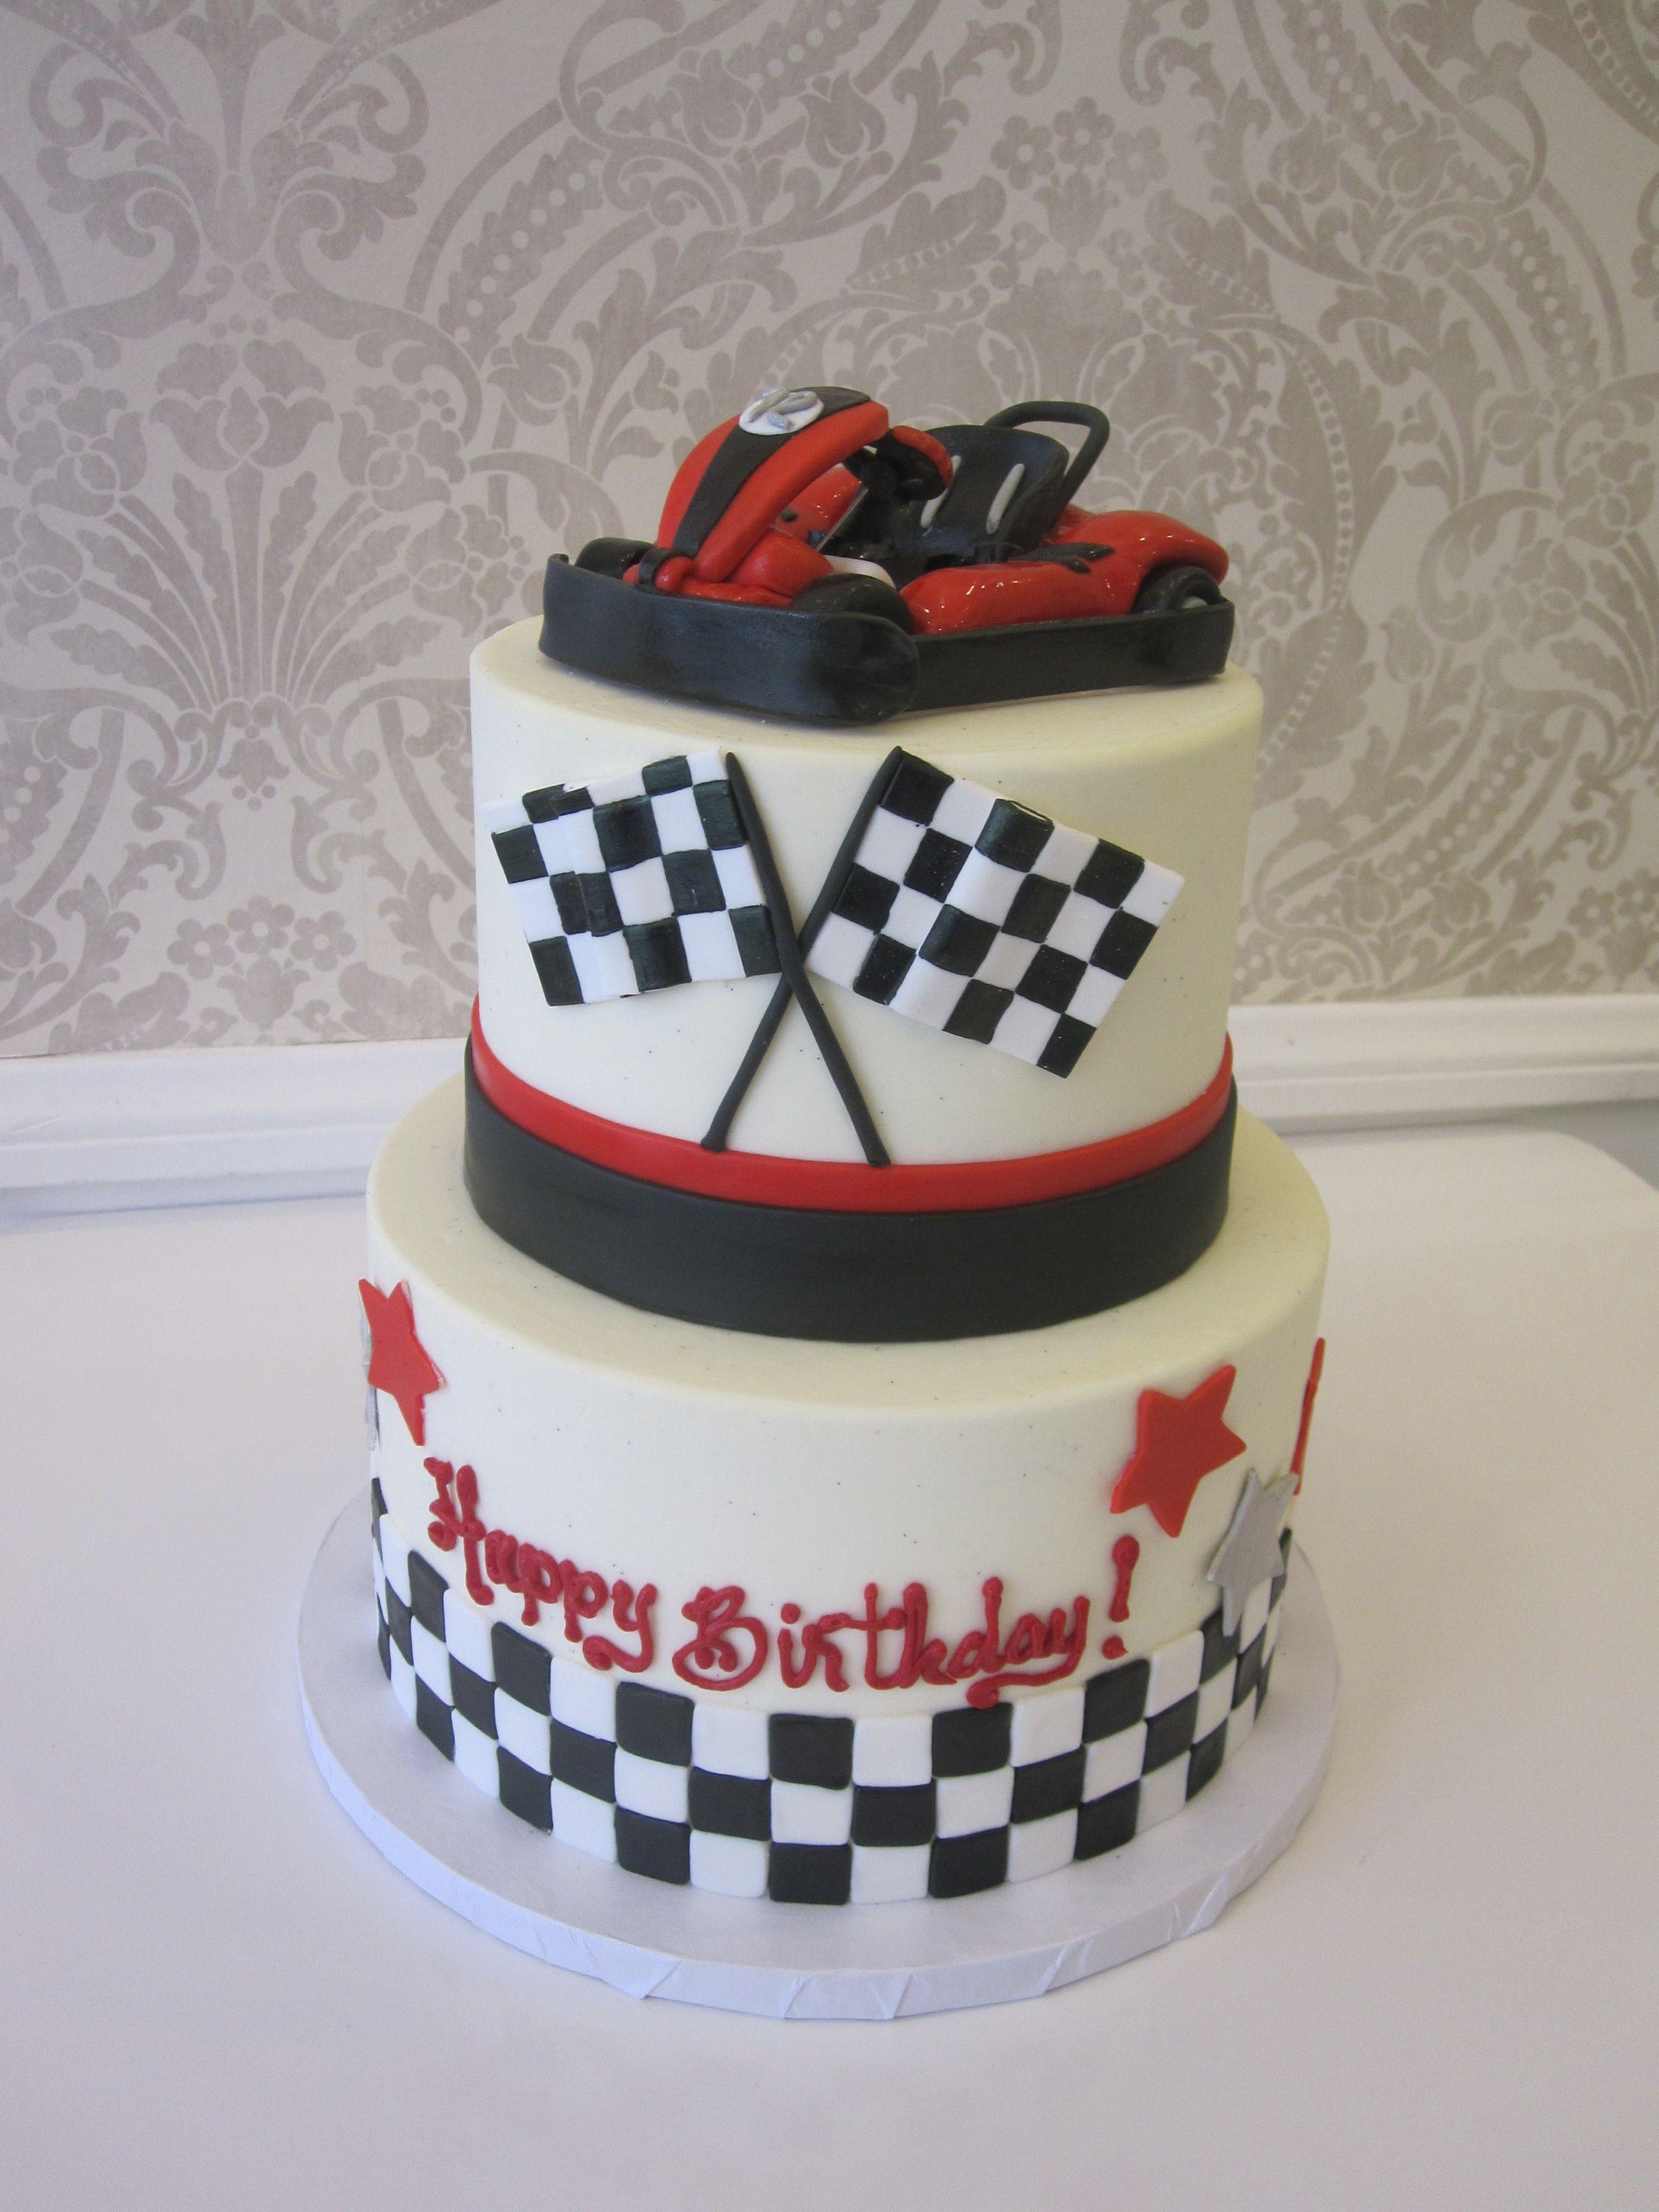 Superb Go Kart Cake By Vanilla Bake Shop Boy Birthday Cake Race Car Funny Birthday Cards Online Aboleapandamsfinfo